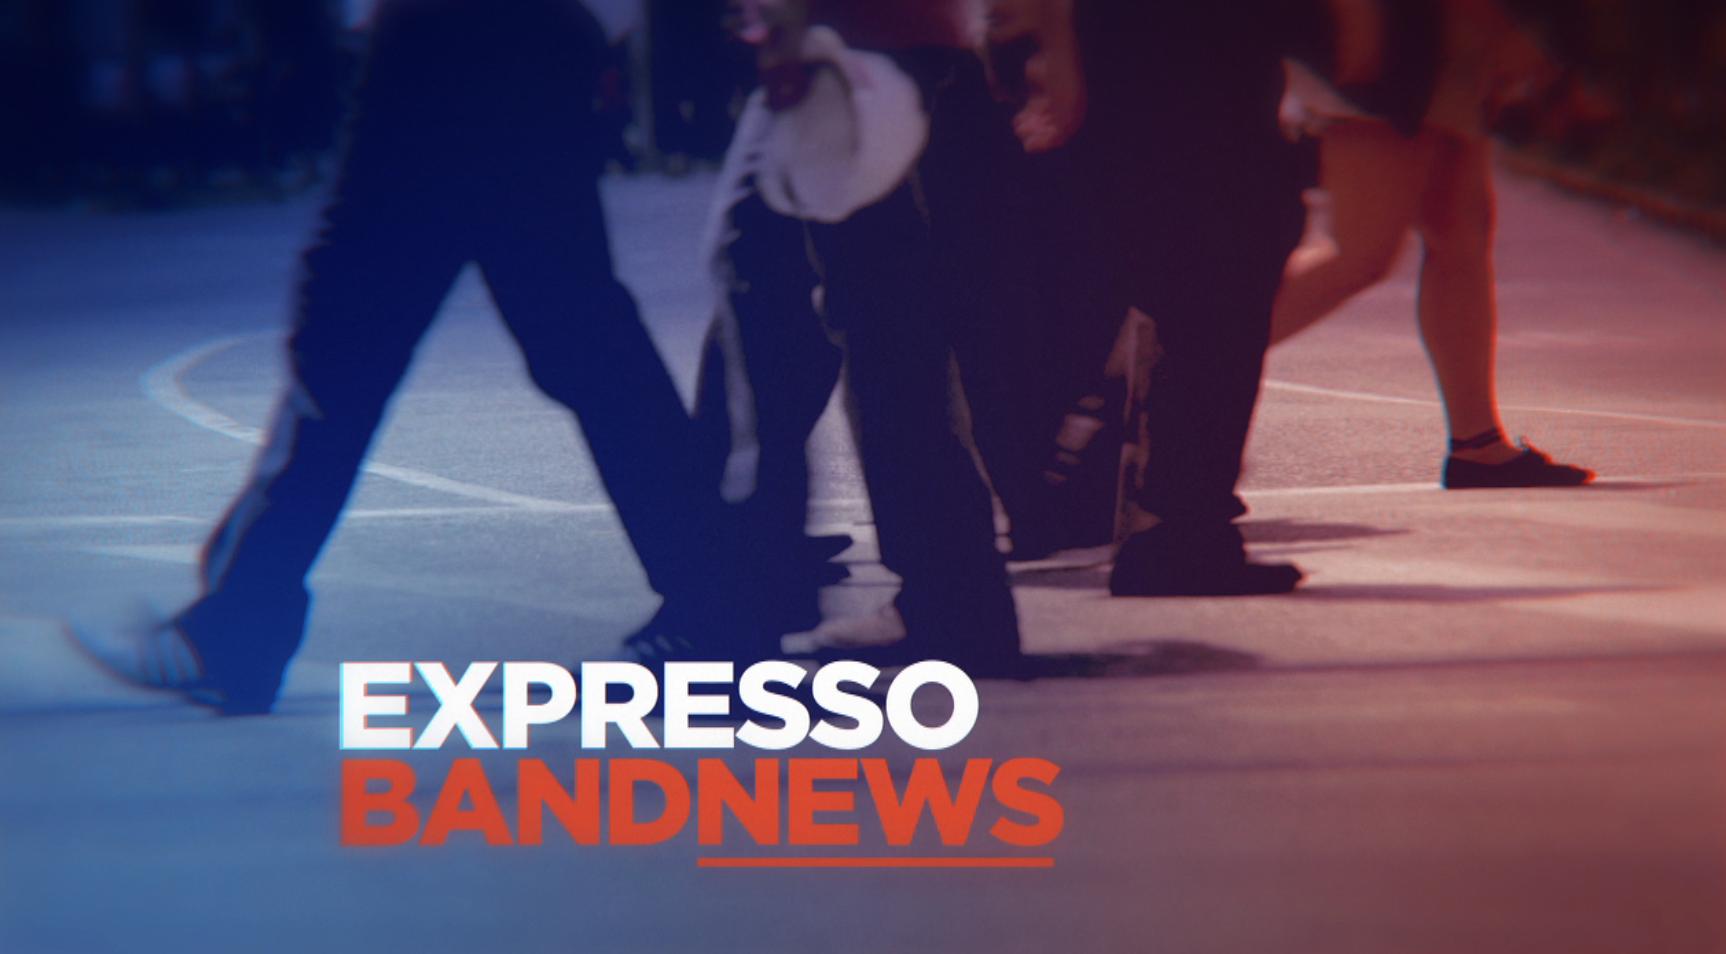 EXPRESSO BANDNEWS